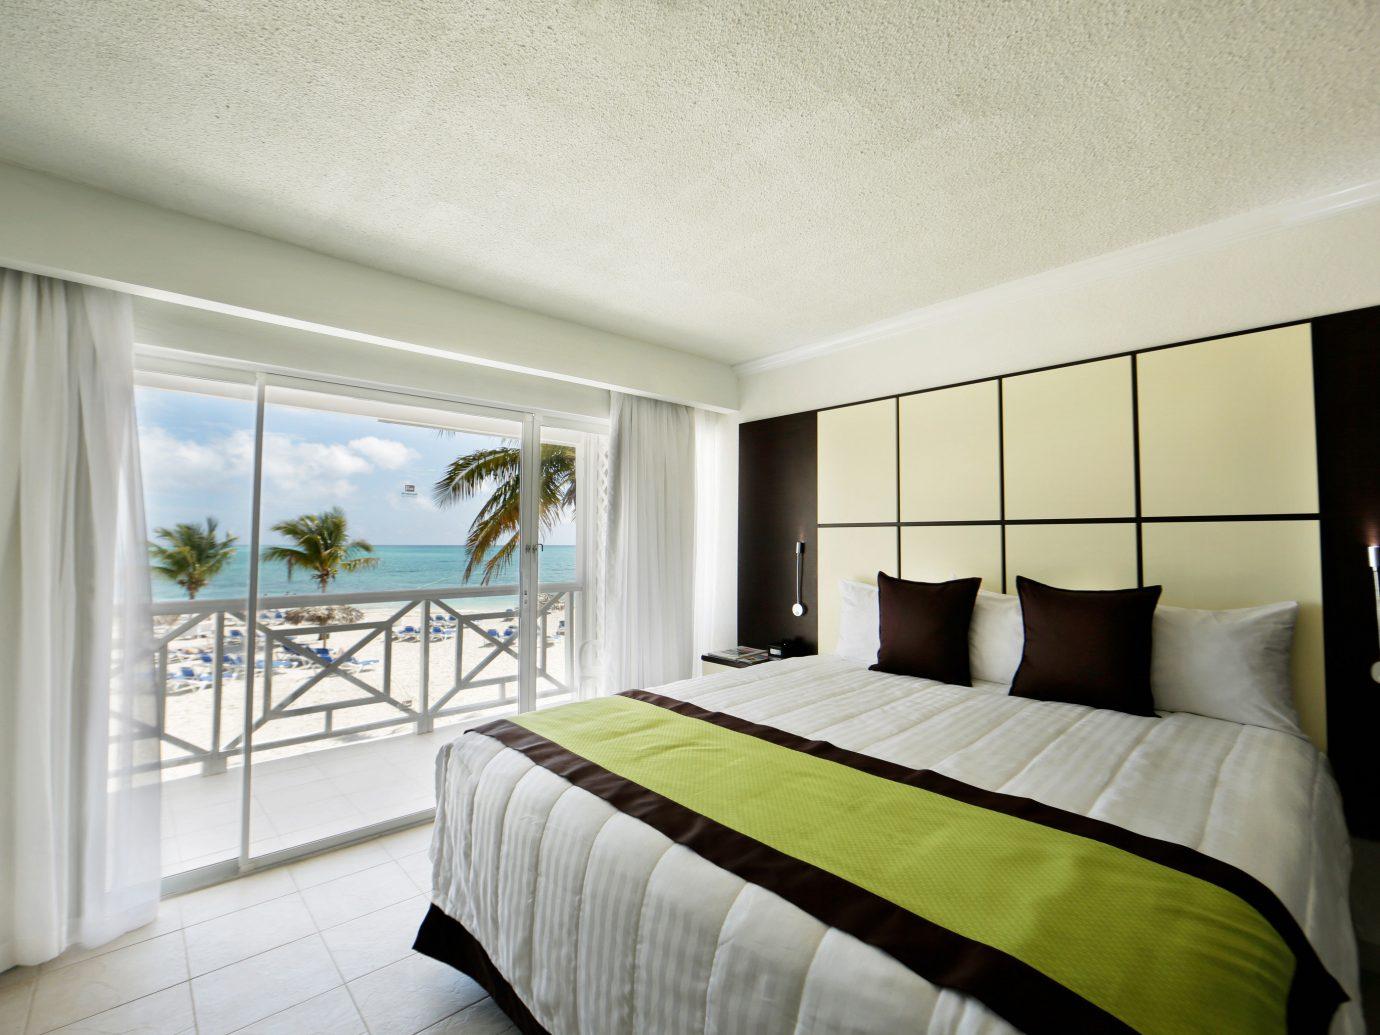 Bedroom at Viva Wyndham Fortuna Beach